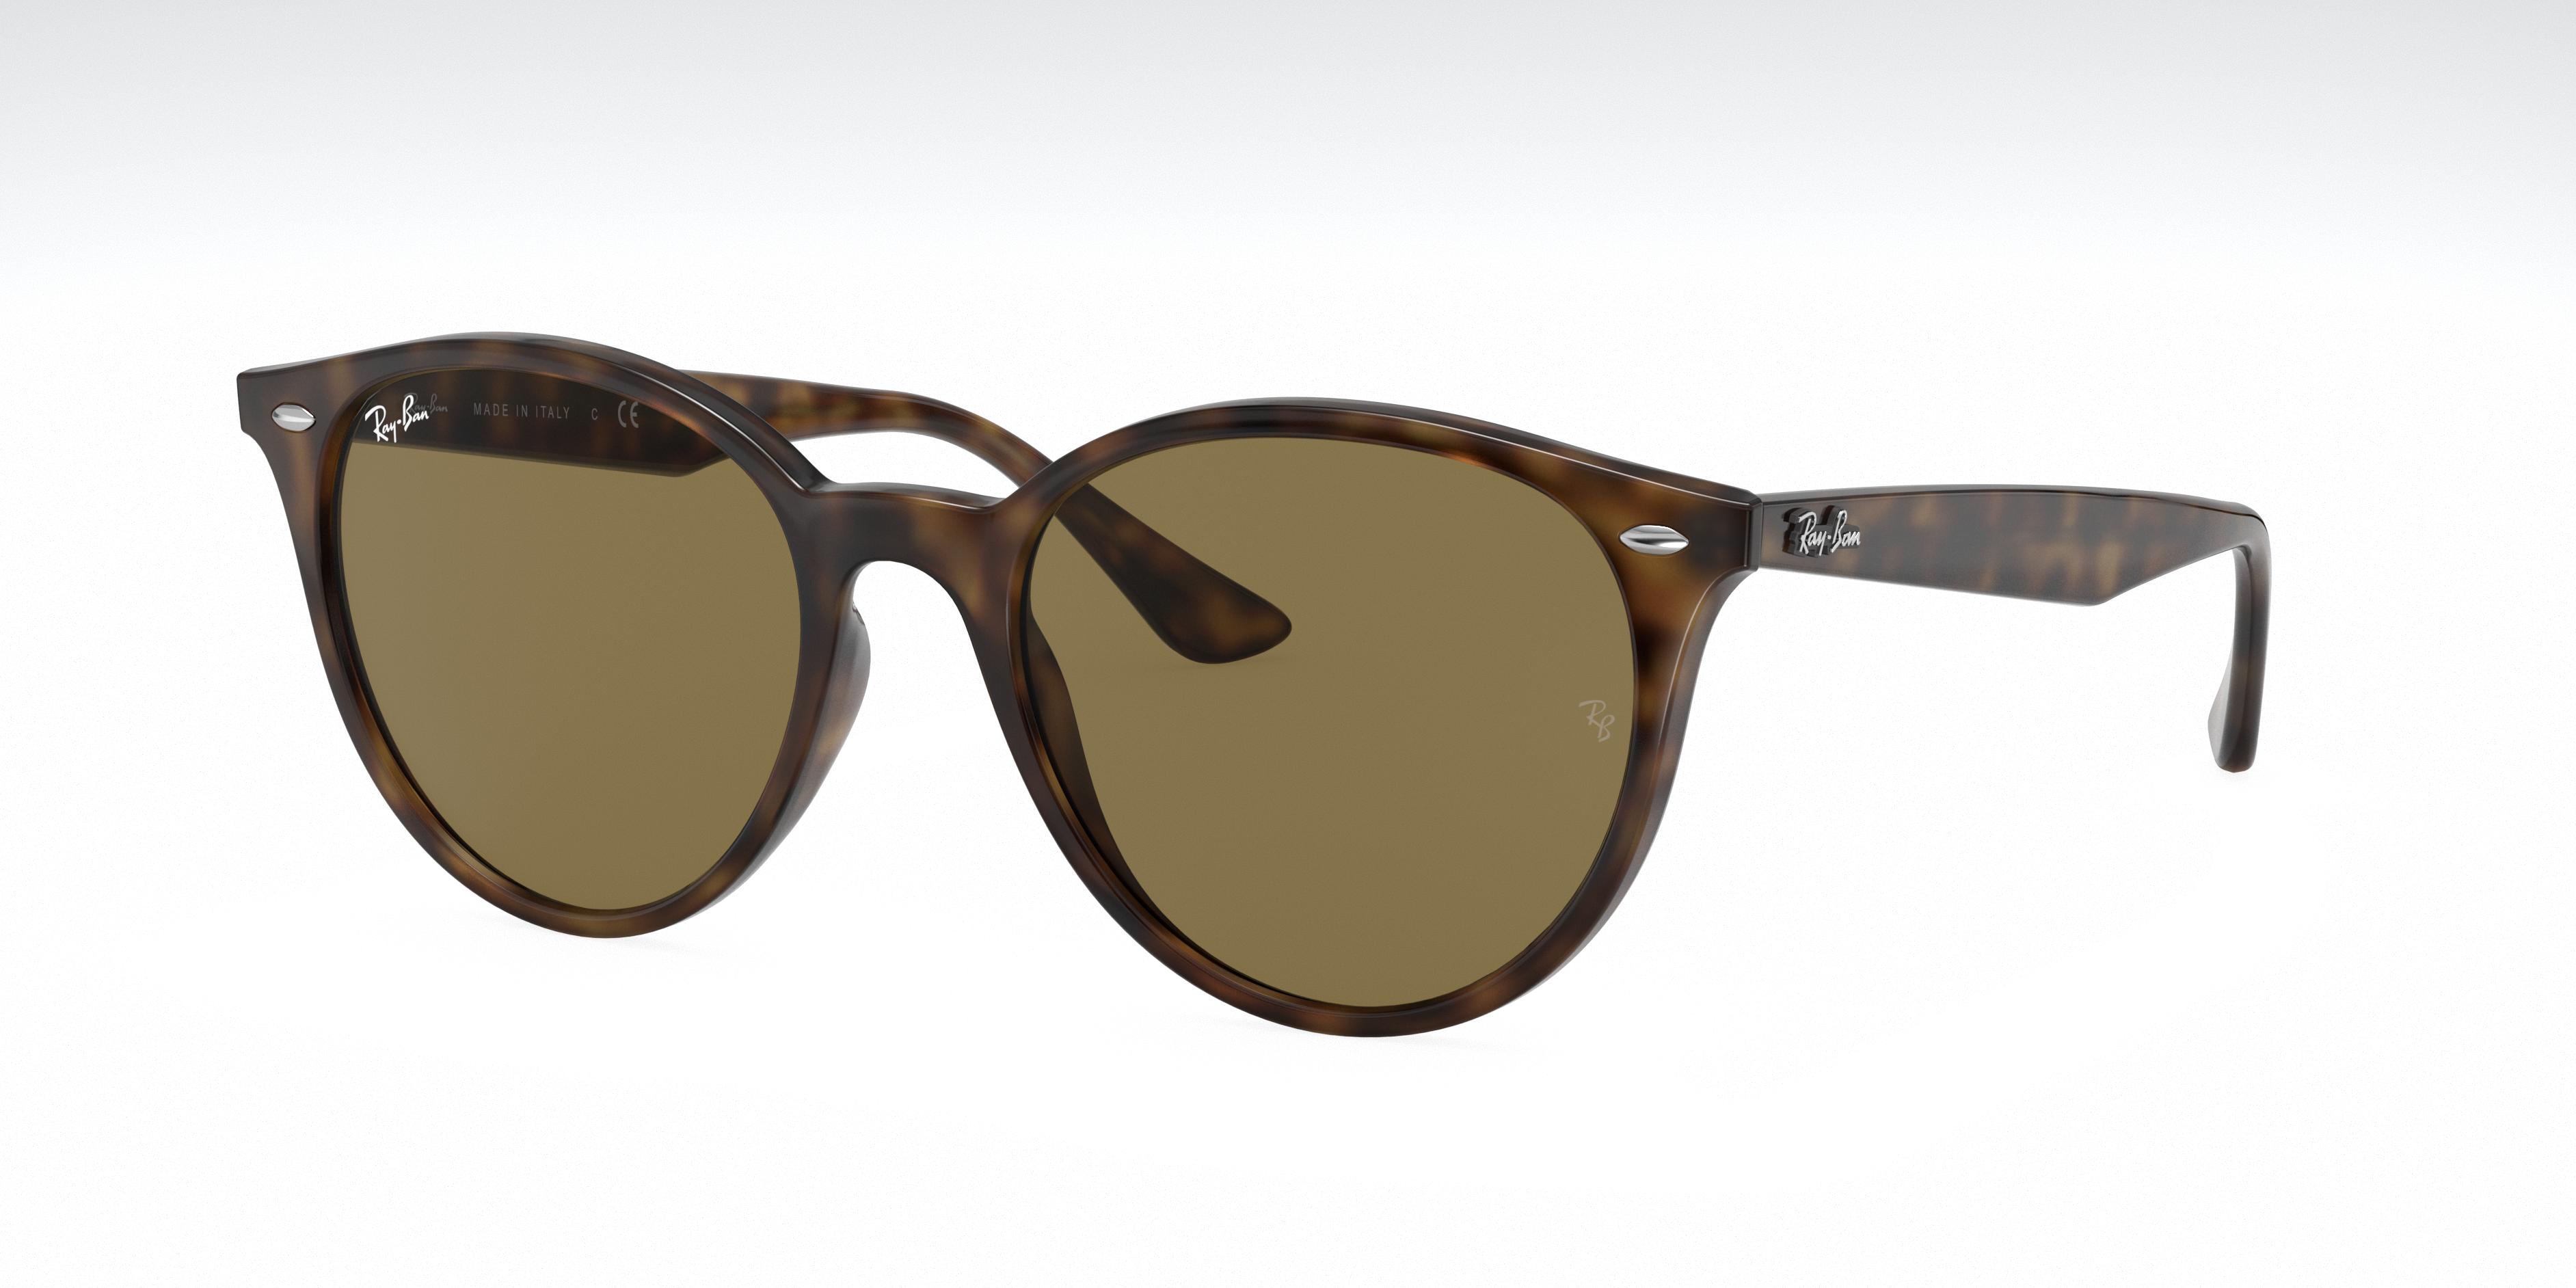 Ray-Ban Rb4305 Tortoise, Brown Lenses - RB4305